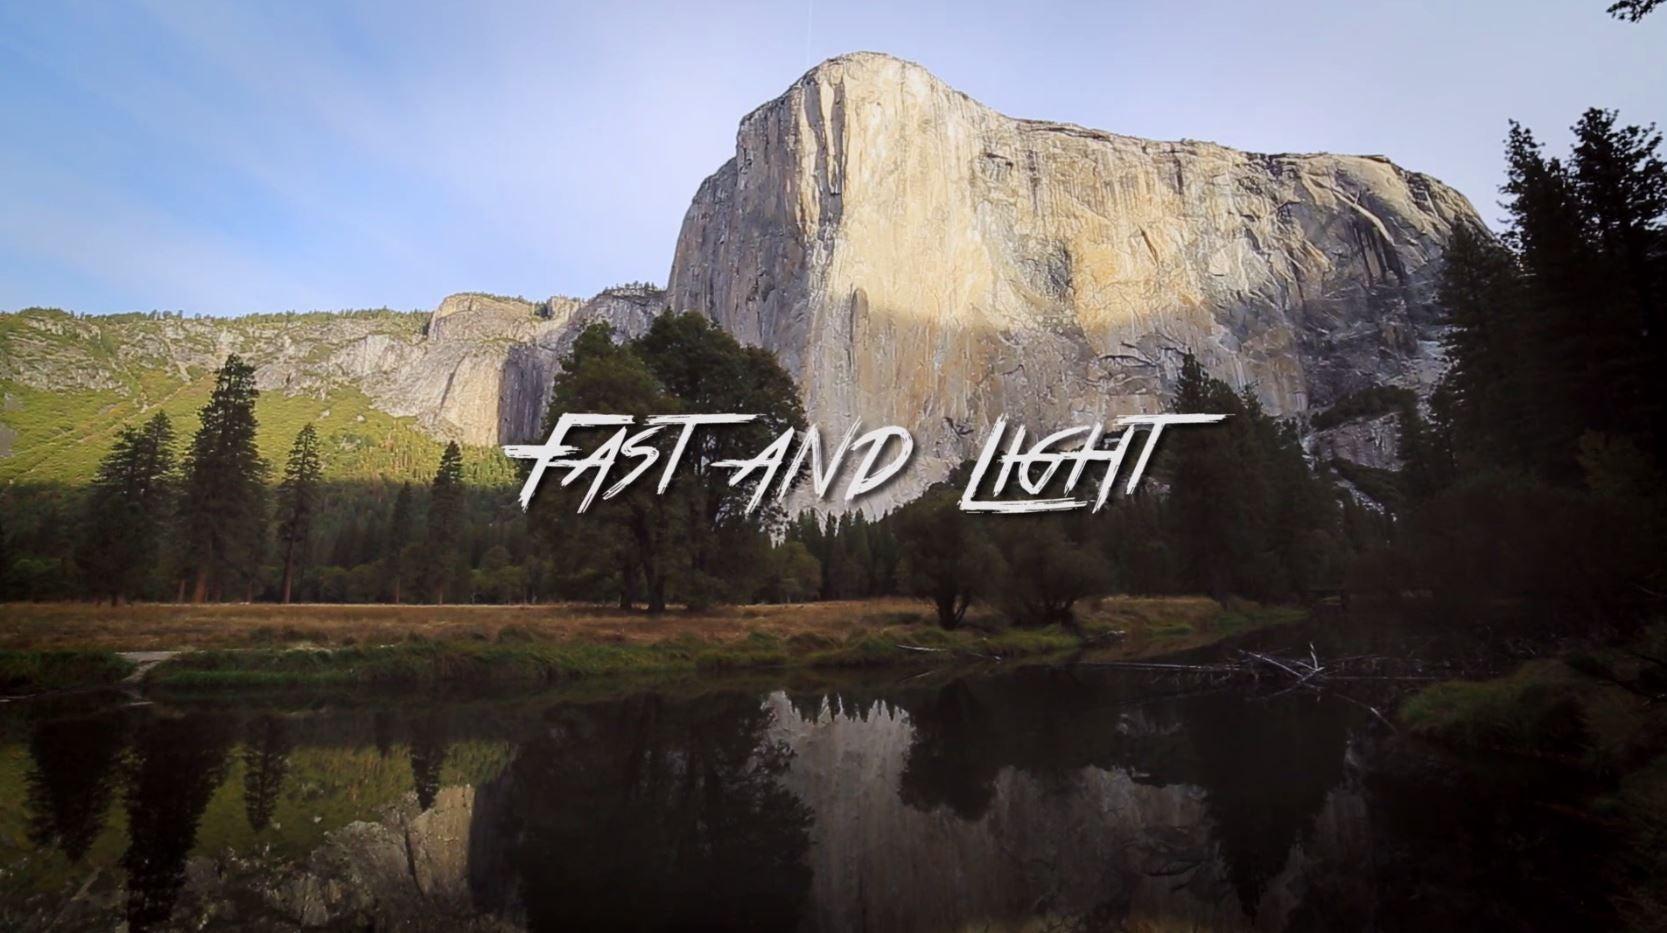 Fast & Light